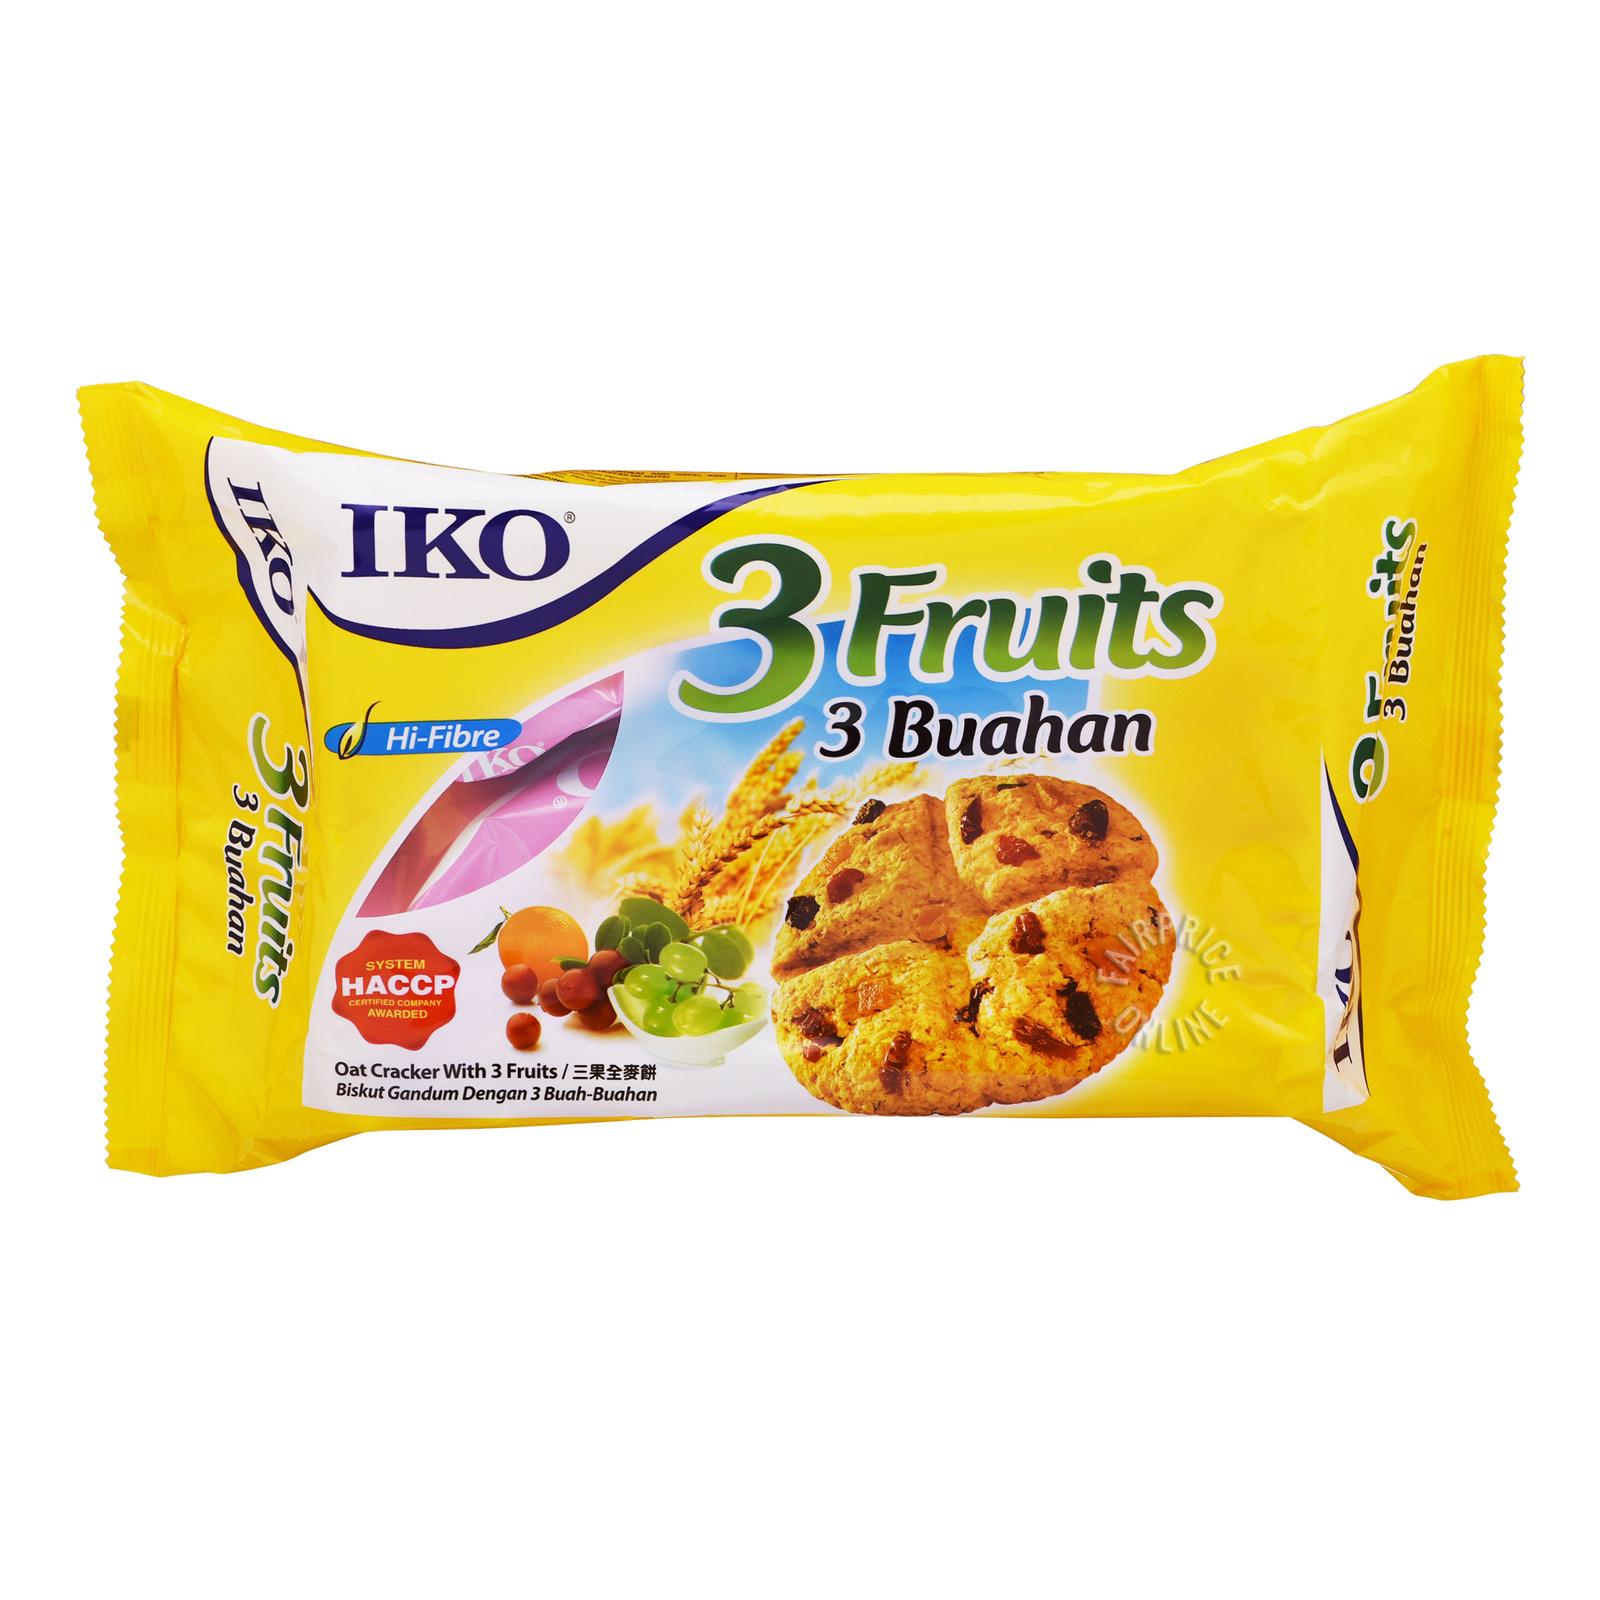 IKO Oat Crackers - 3 Fruits